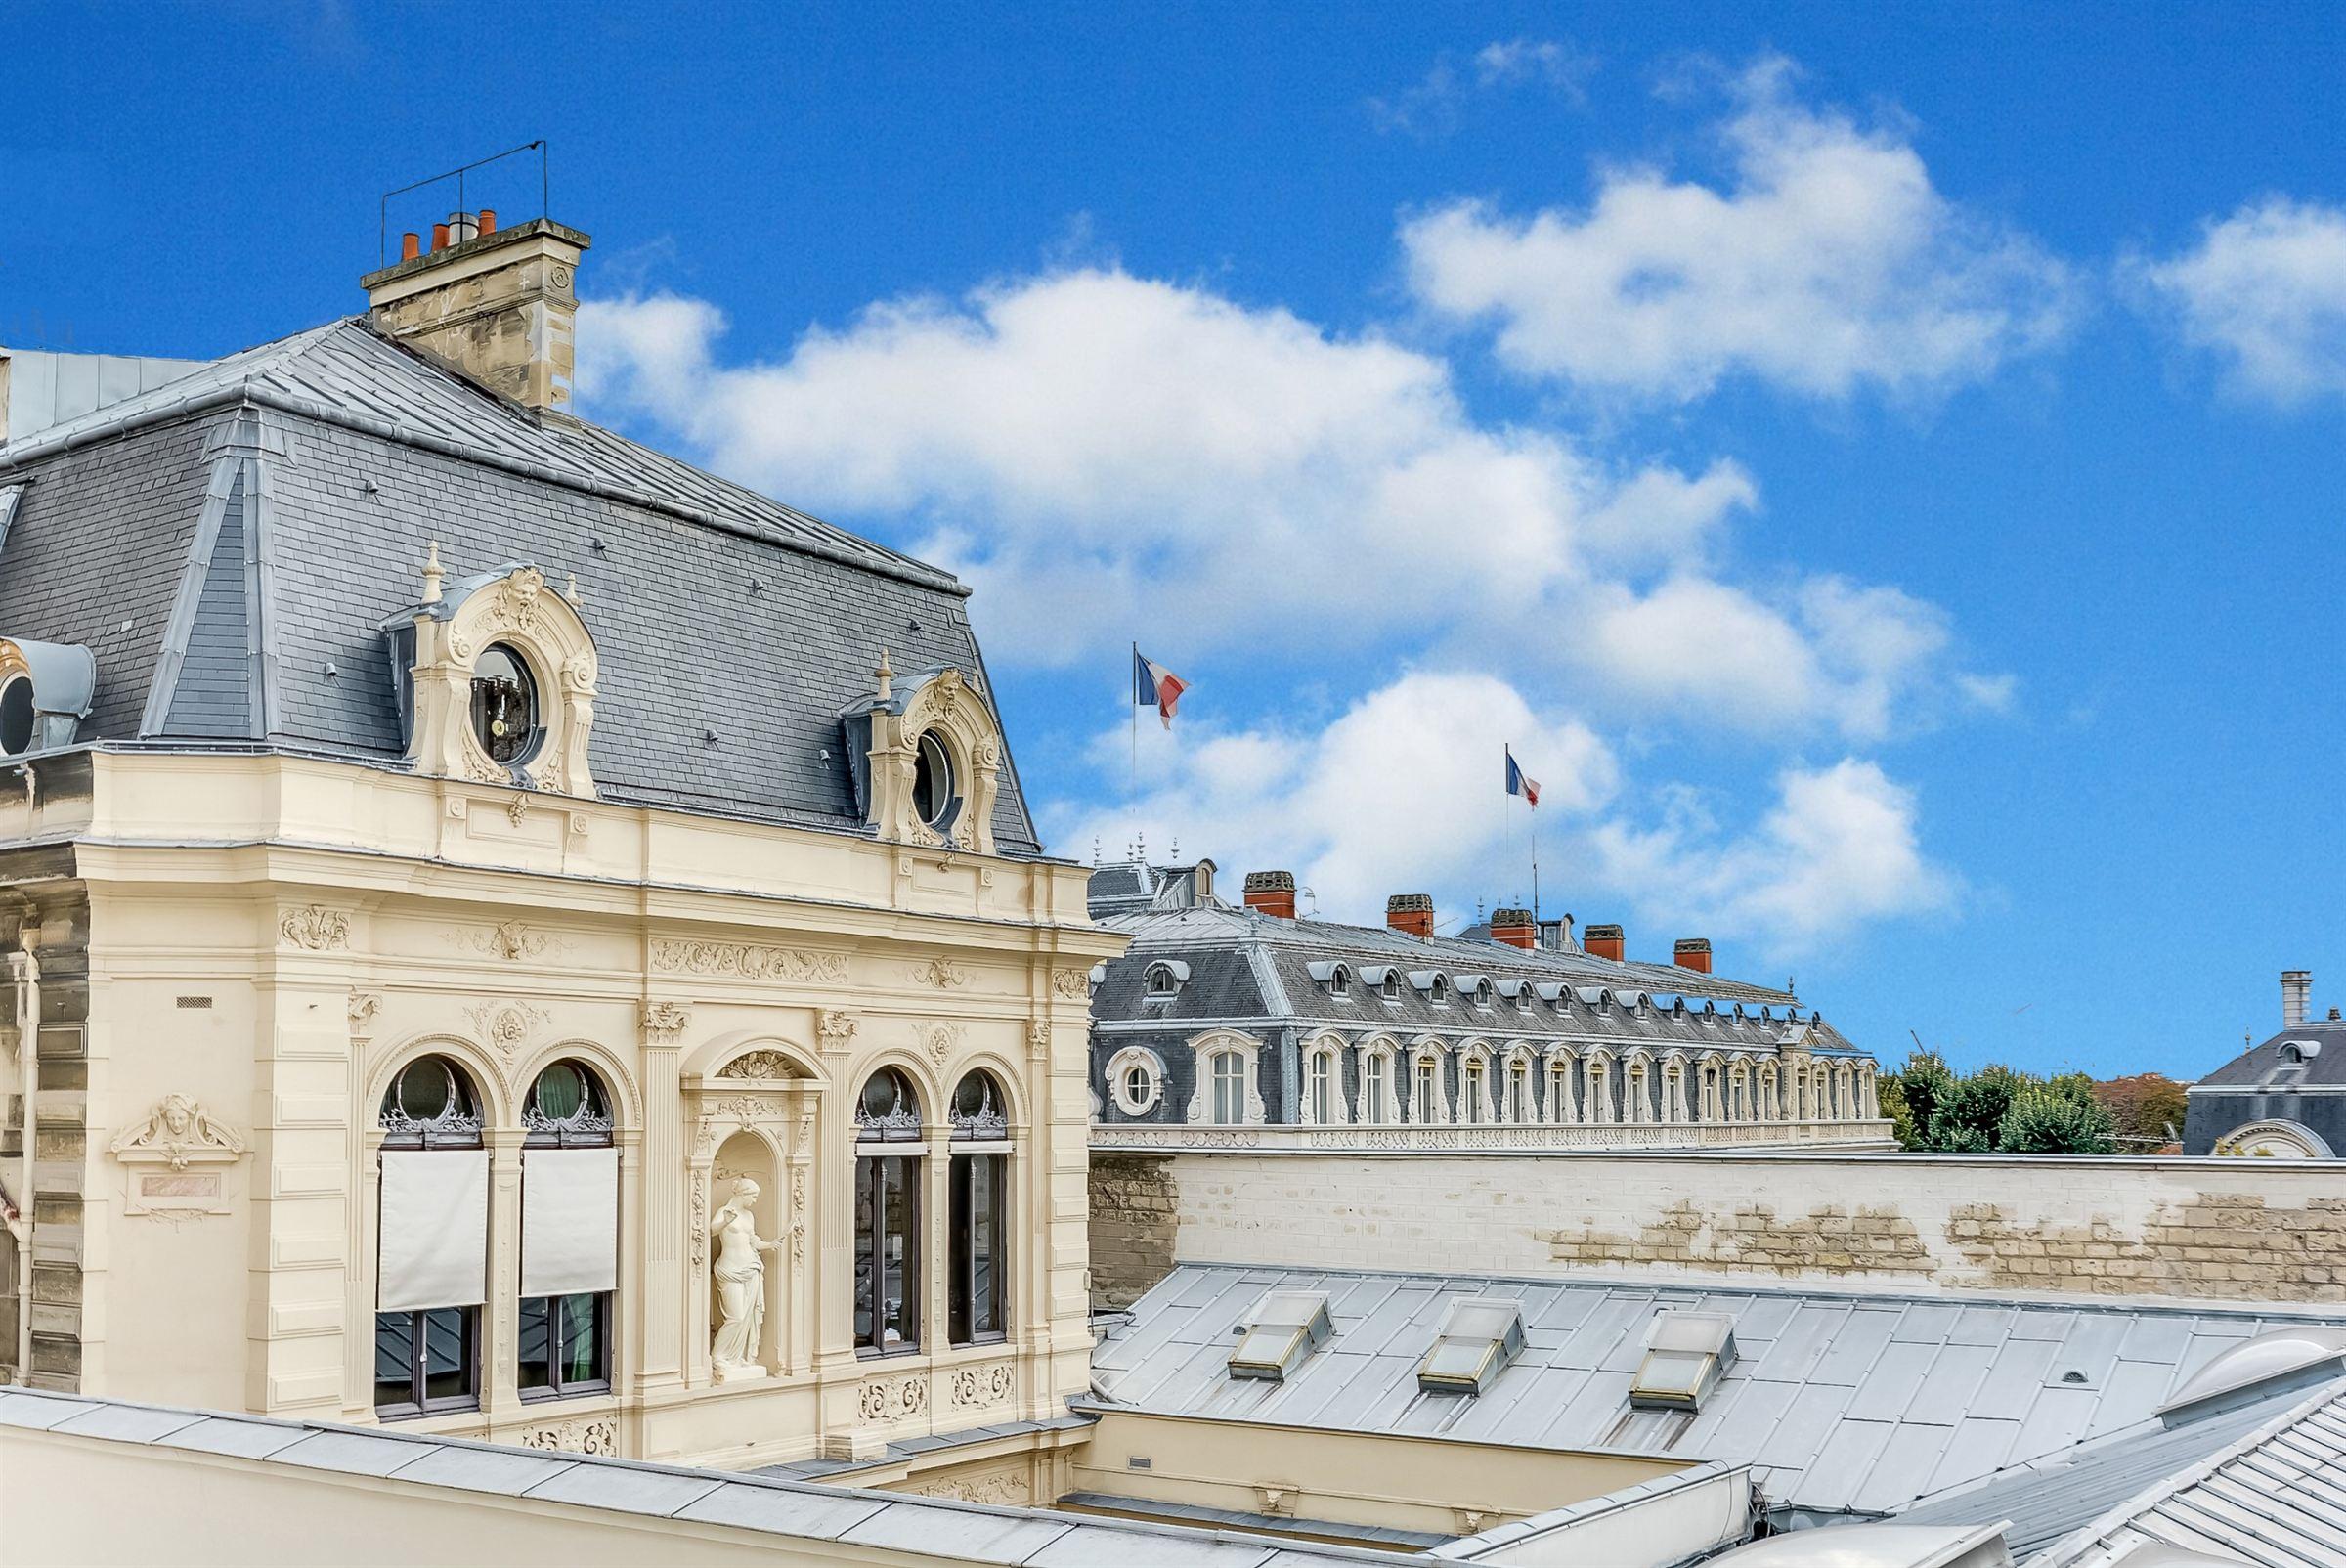 Apartamento por un Venta en Paris 8 - Montaigne. Apartment 56 sq.m. Stunning view Paris, Paris, 75008 Francia